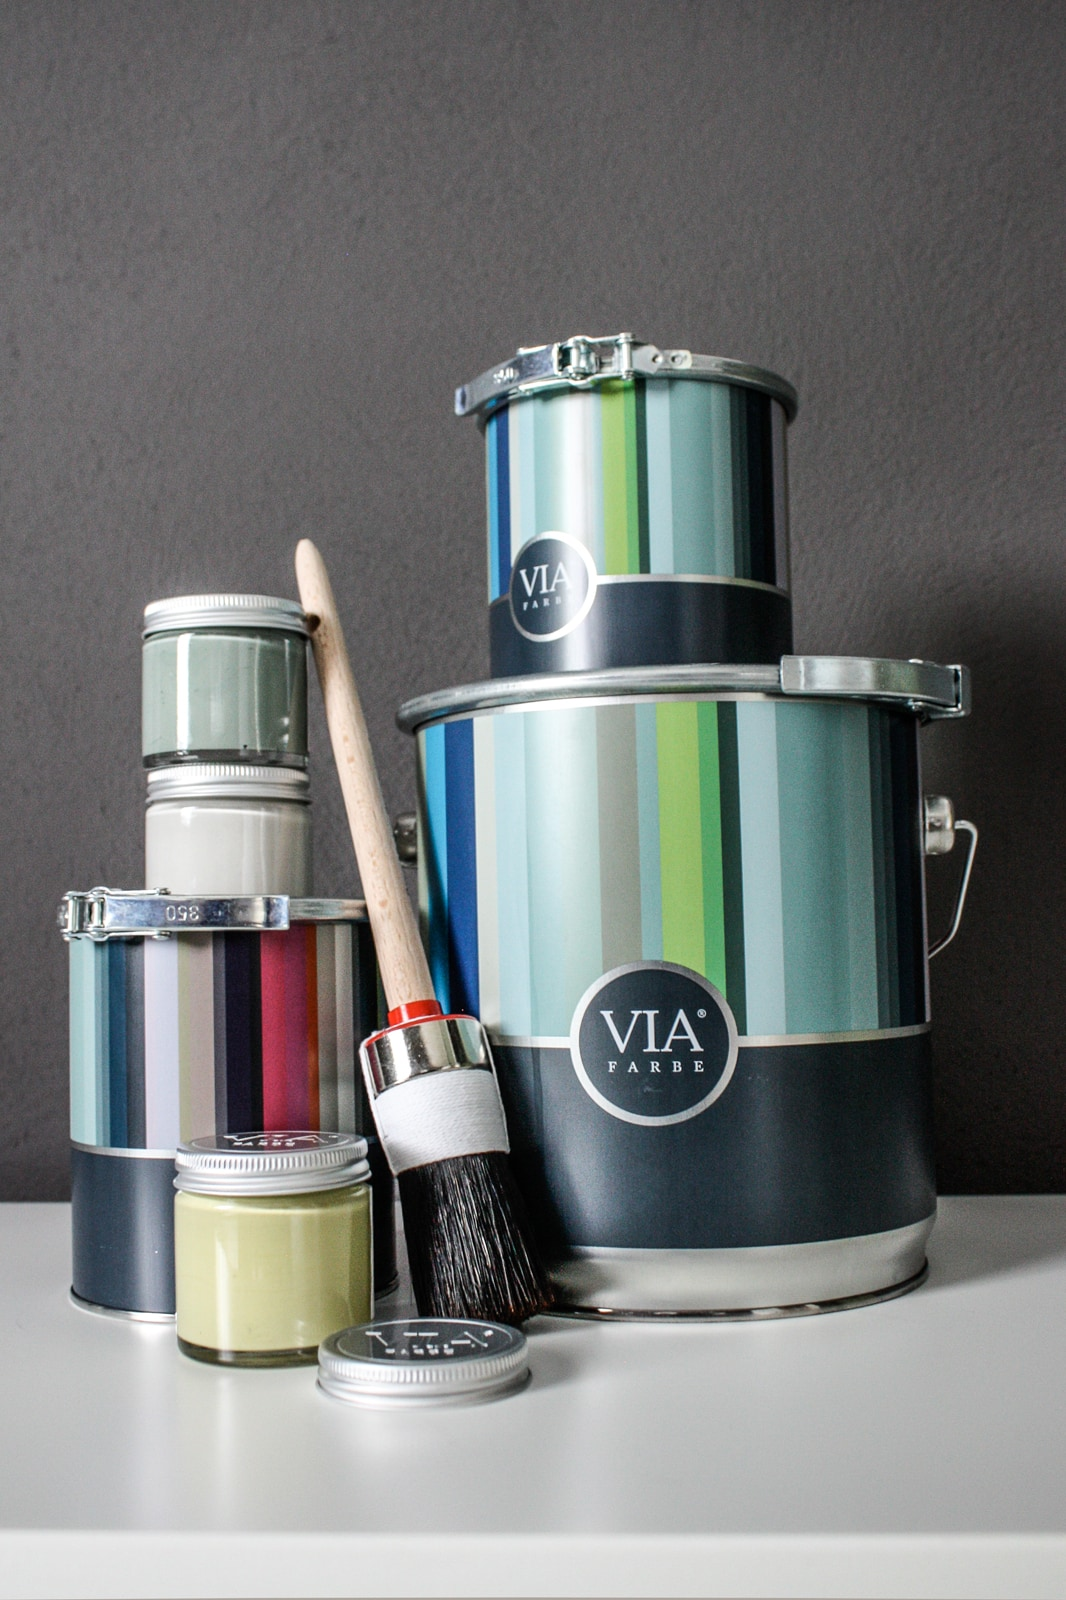 VIA-Kreidefarbe-Gläschen-Pinsel-Dose-B